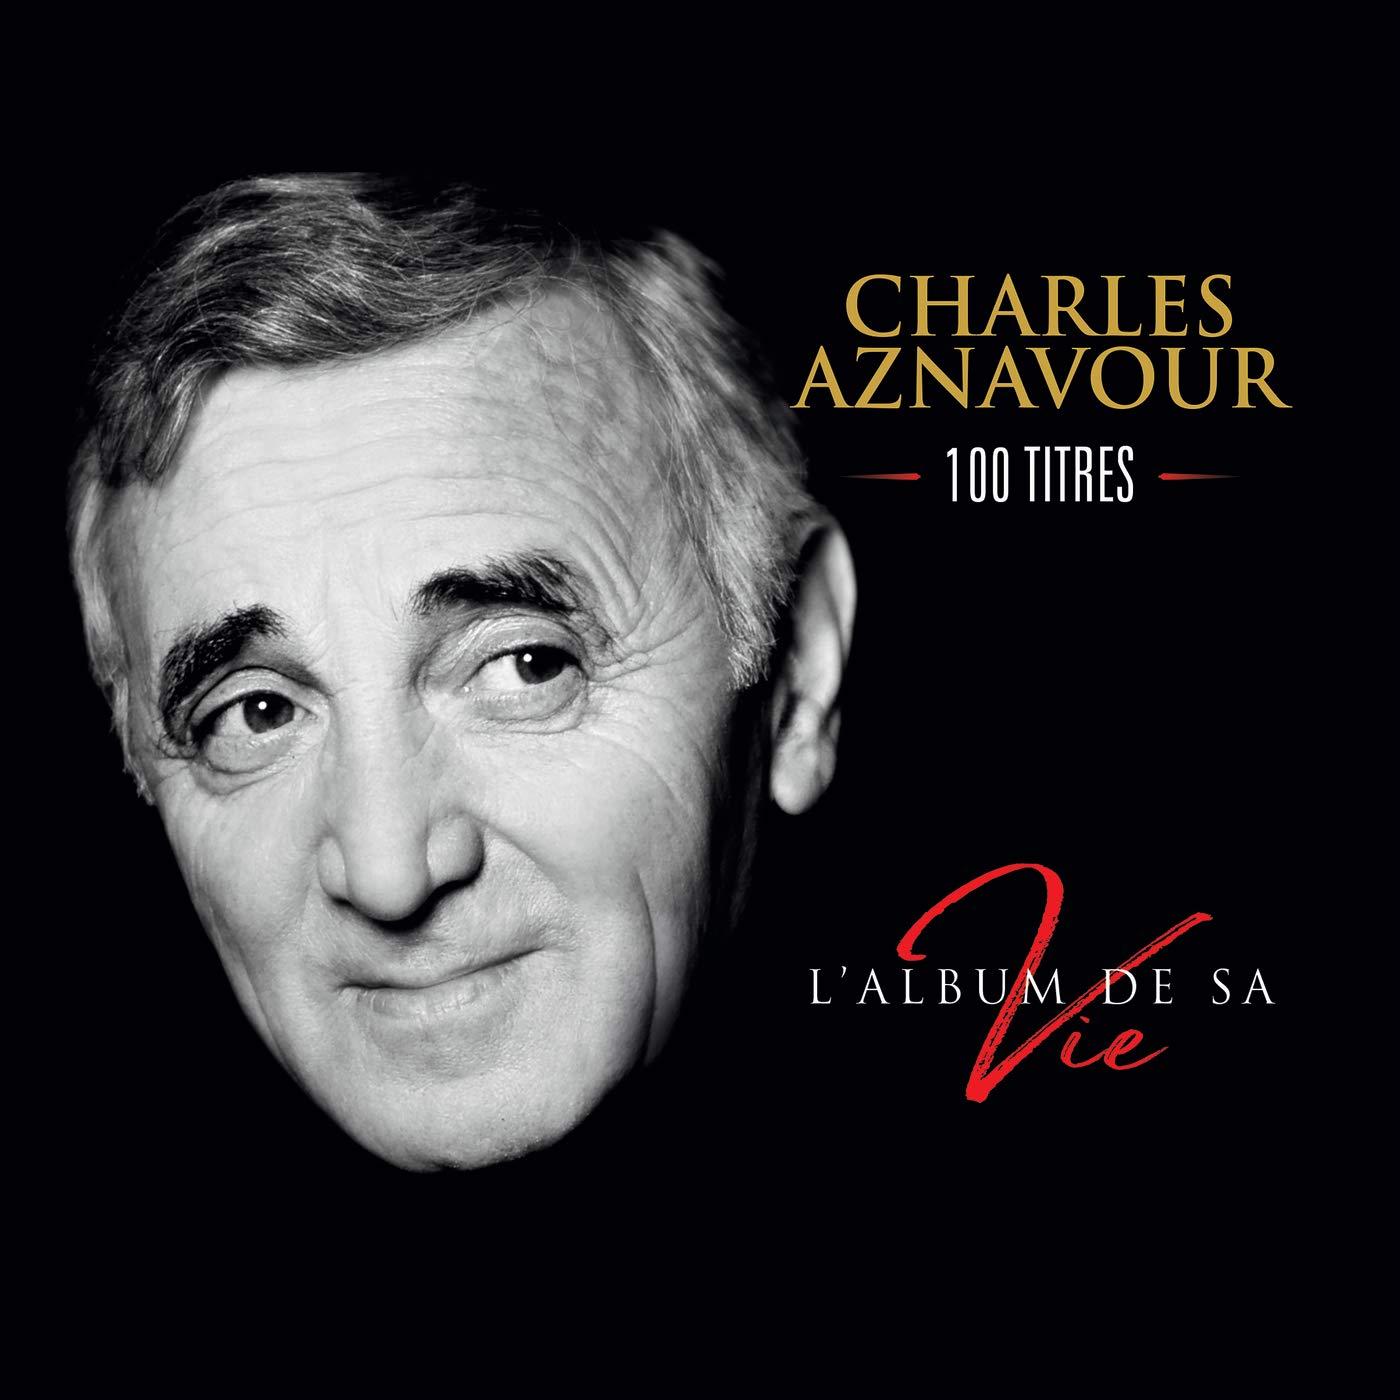 лучшая цена Charles Aznavour. L'album De Sa Vie 100 Titres (5 CD)